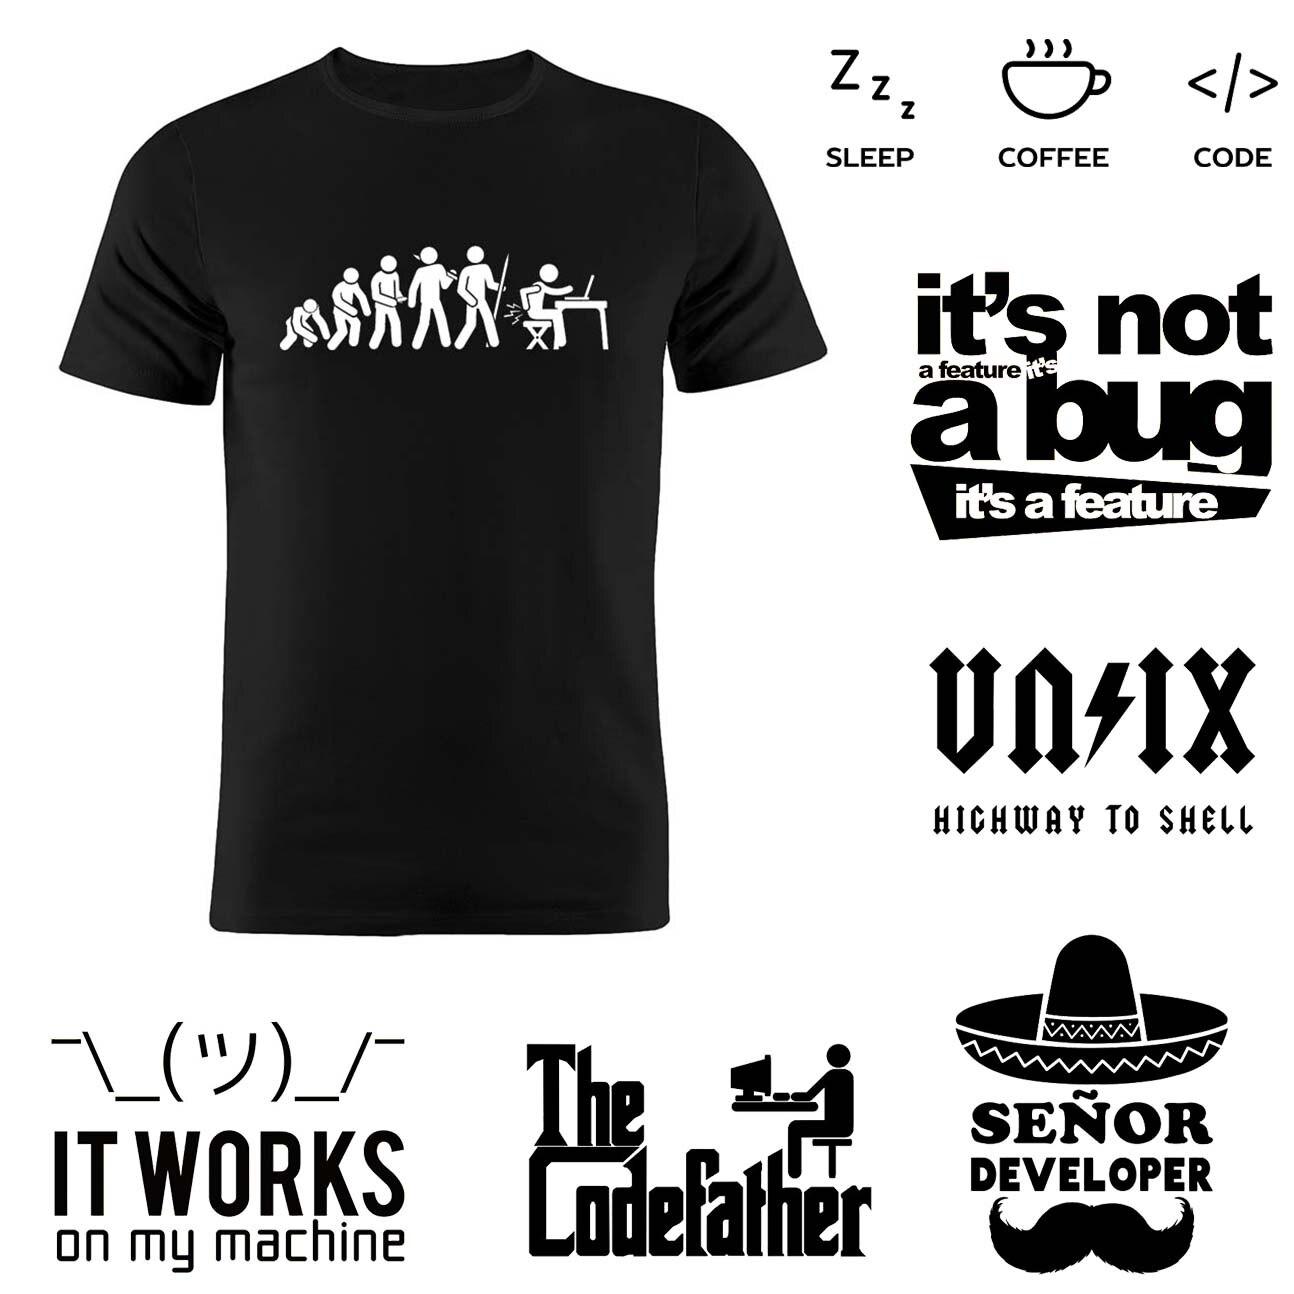 Для мужчин забавно кодер Футболка 100% хлопок Эволюция программист футболки компьютерной науки инженер Geek XS-3XL